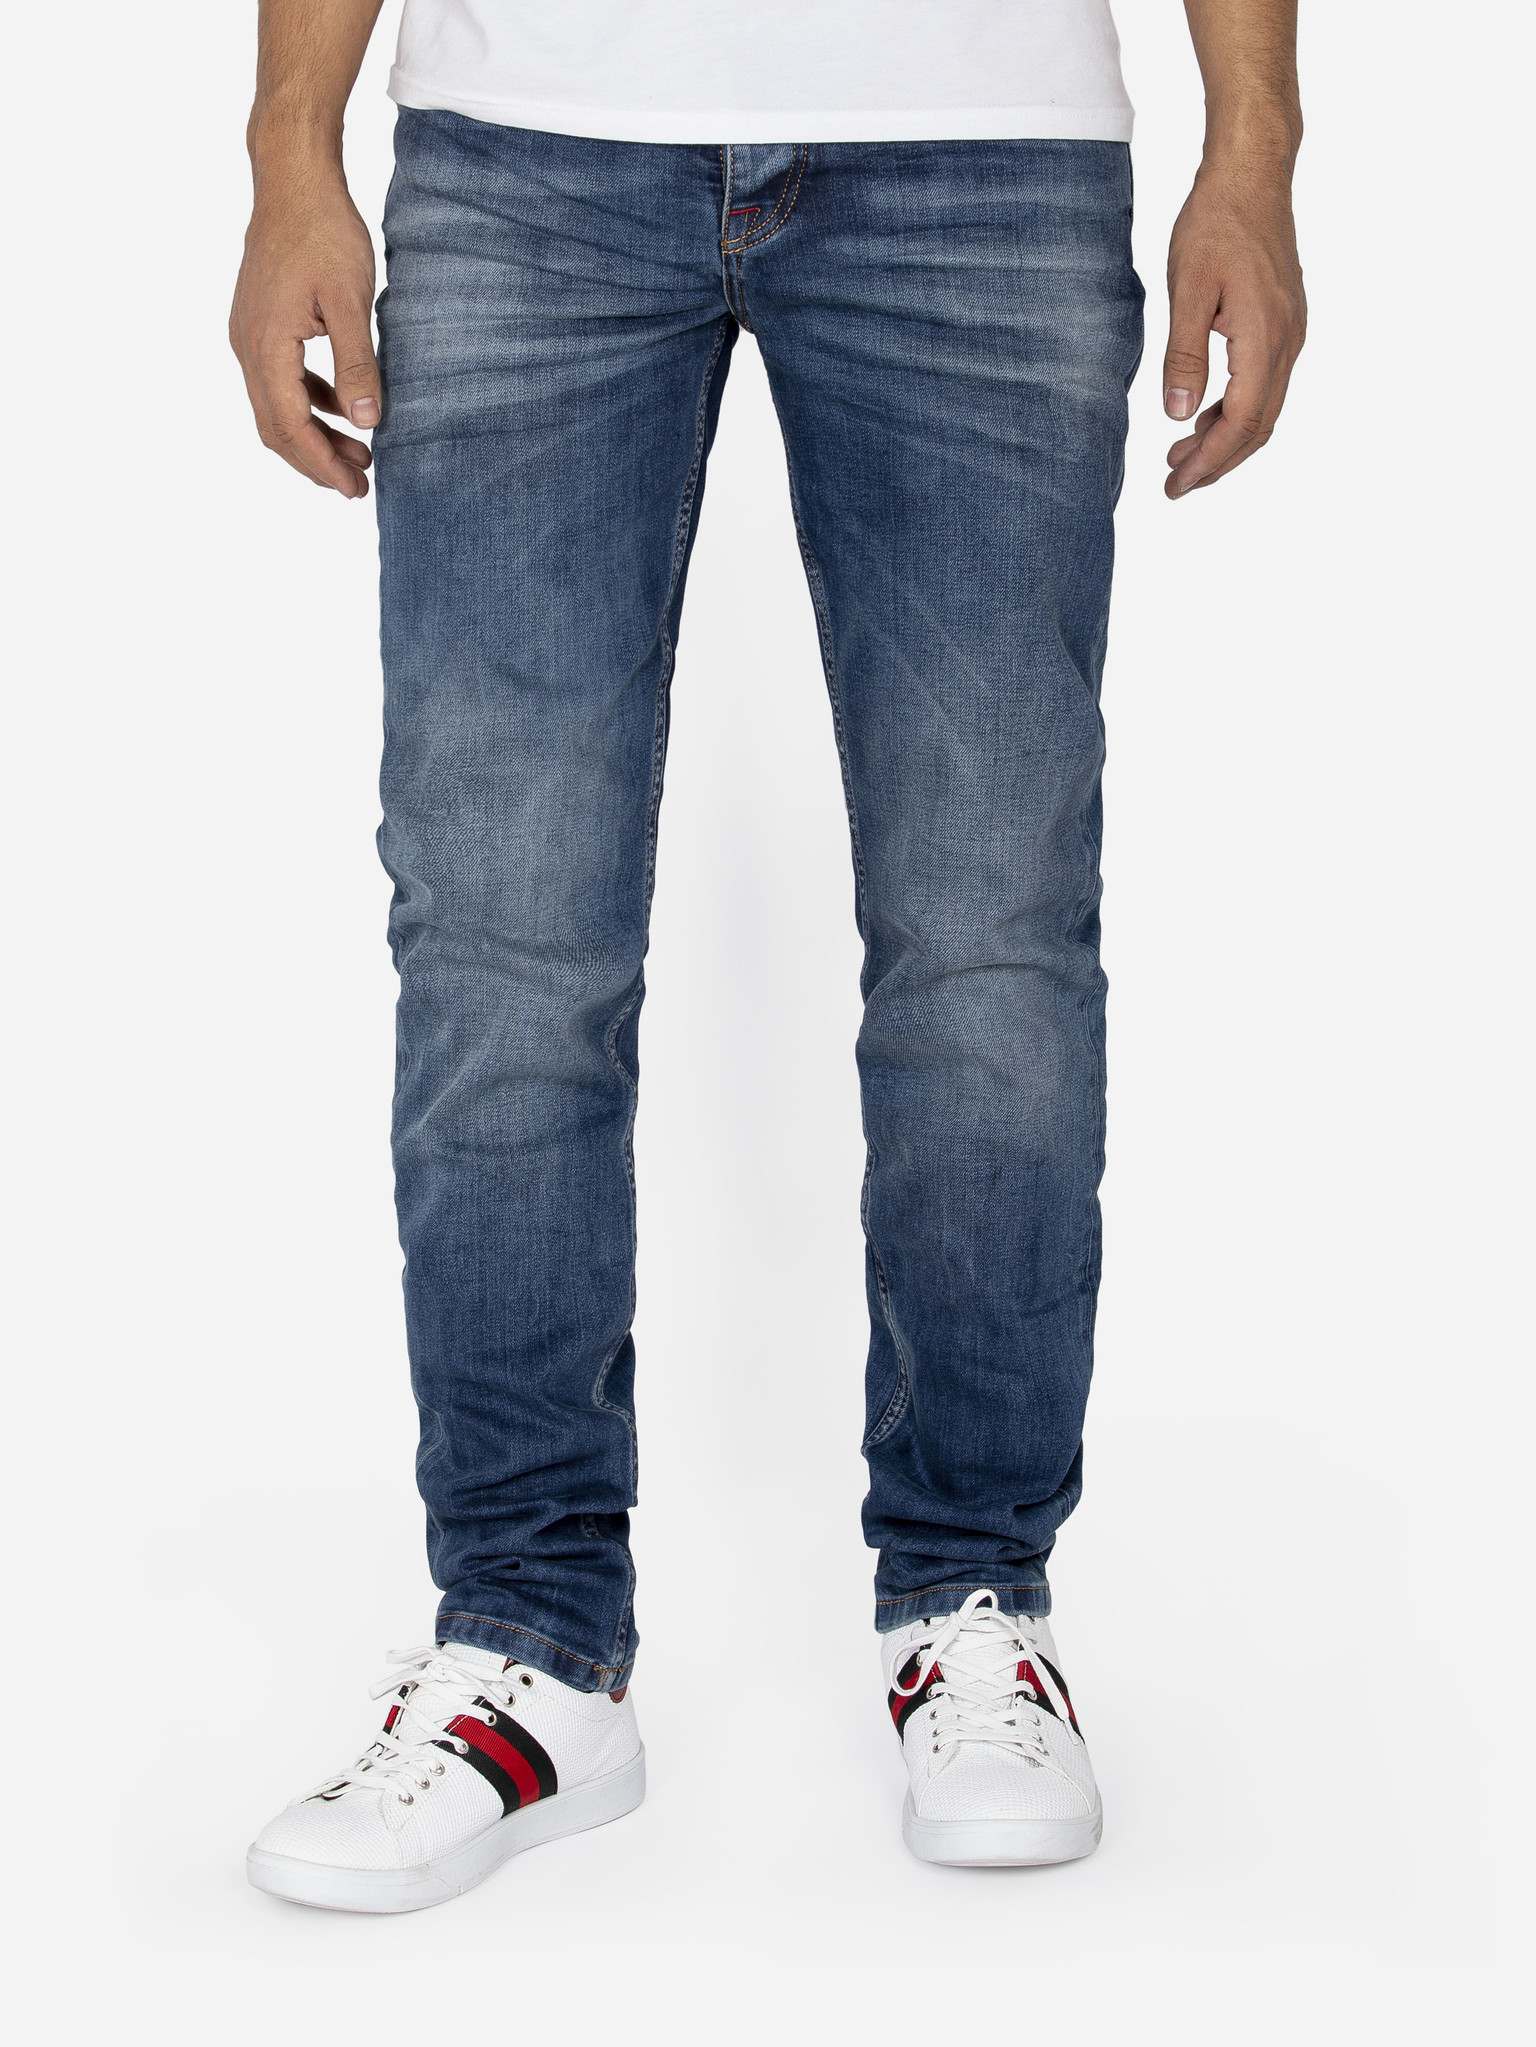 Wam Denim Jeans  Maat: 38/34